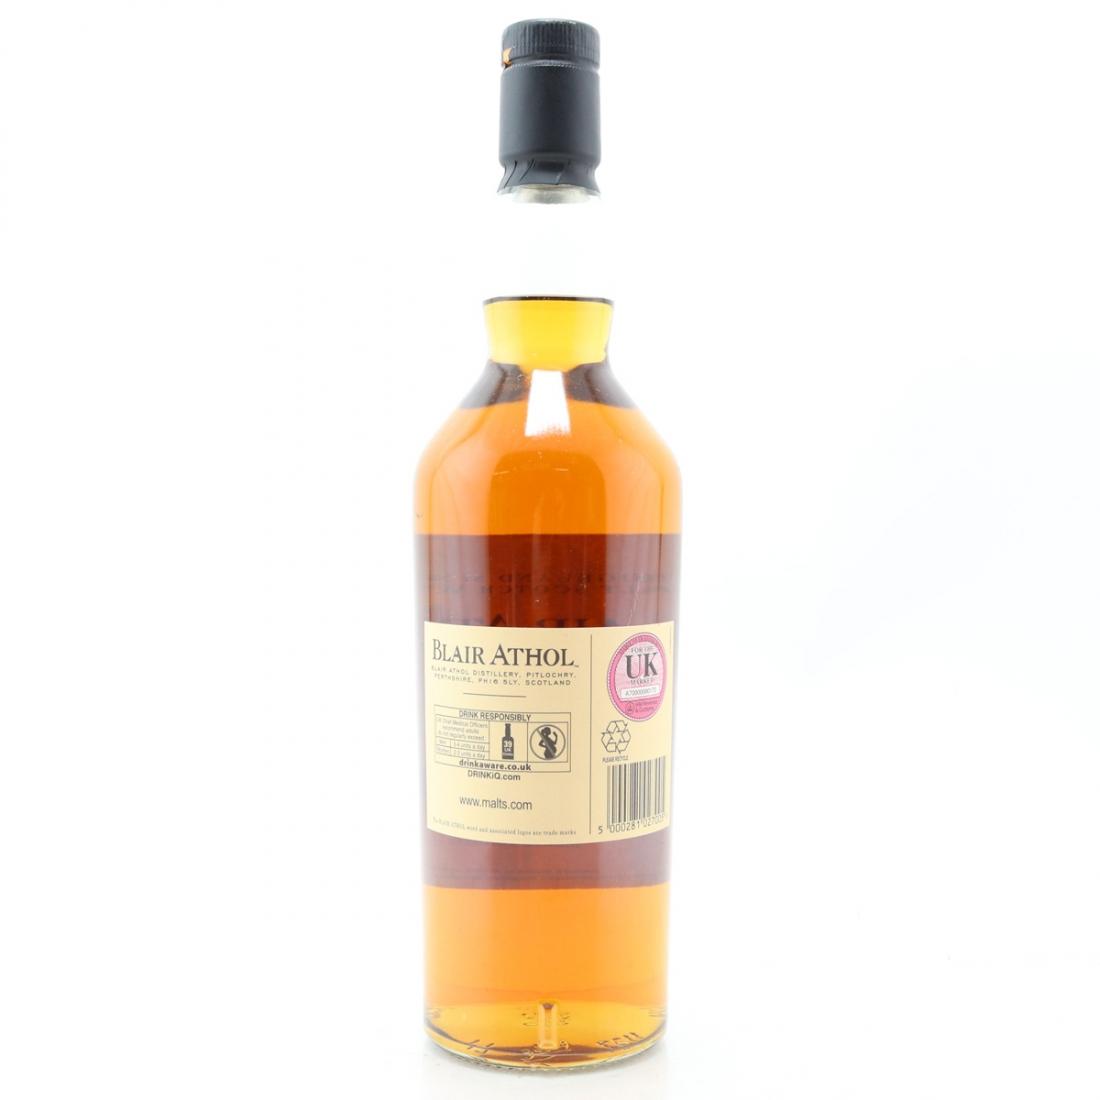 Blair Athol Cask Strength Distillery Exclusive 2010